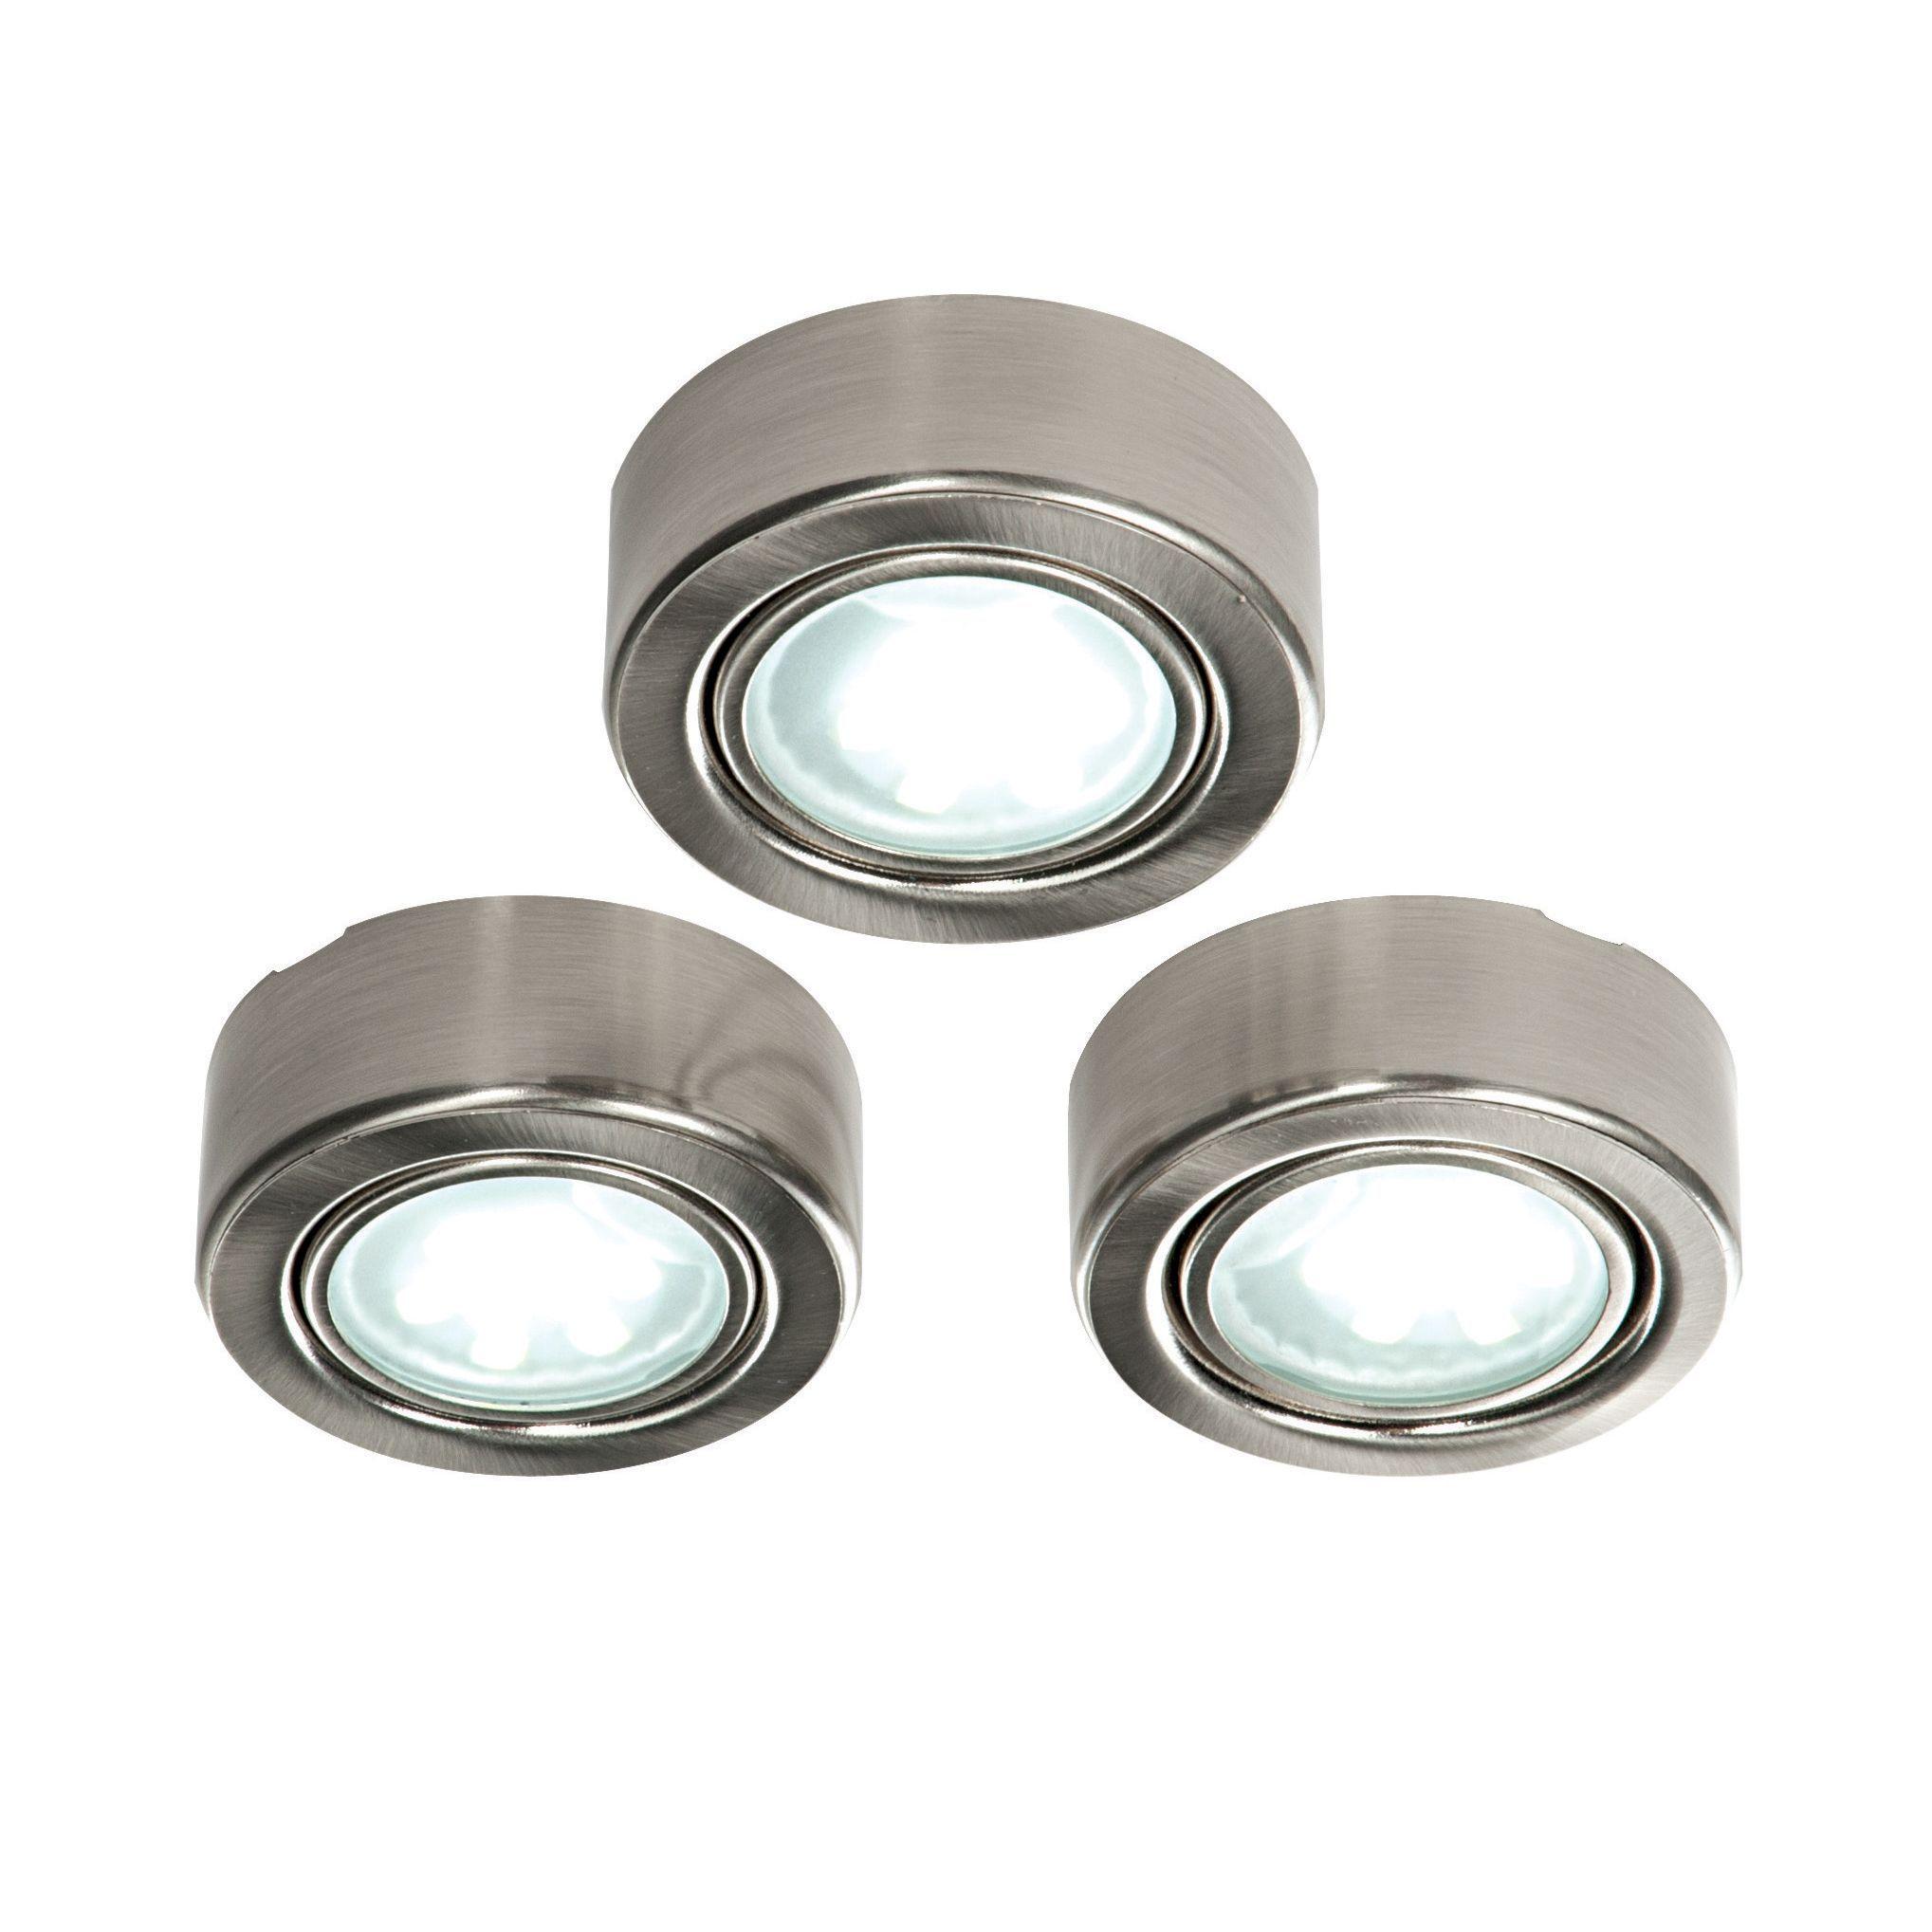 Masterlite Led 1 8w Cabinet Light Pack Of 3 Departments